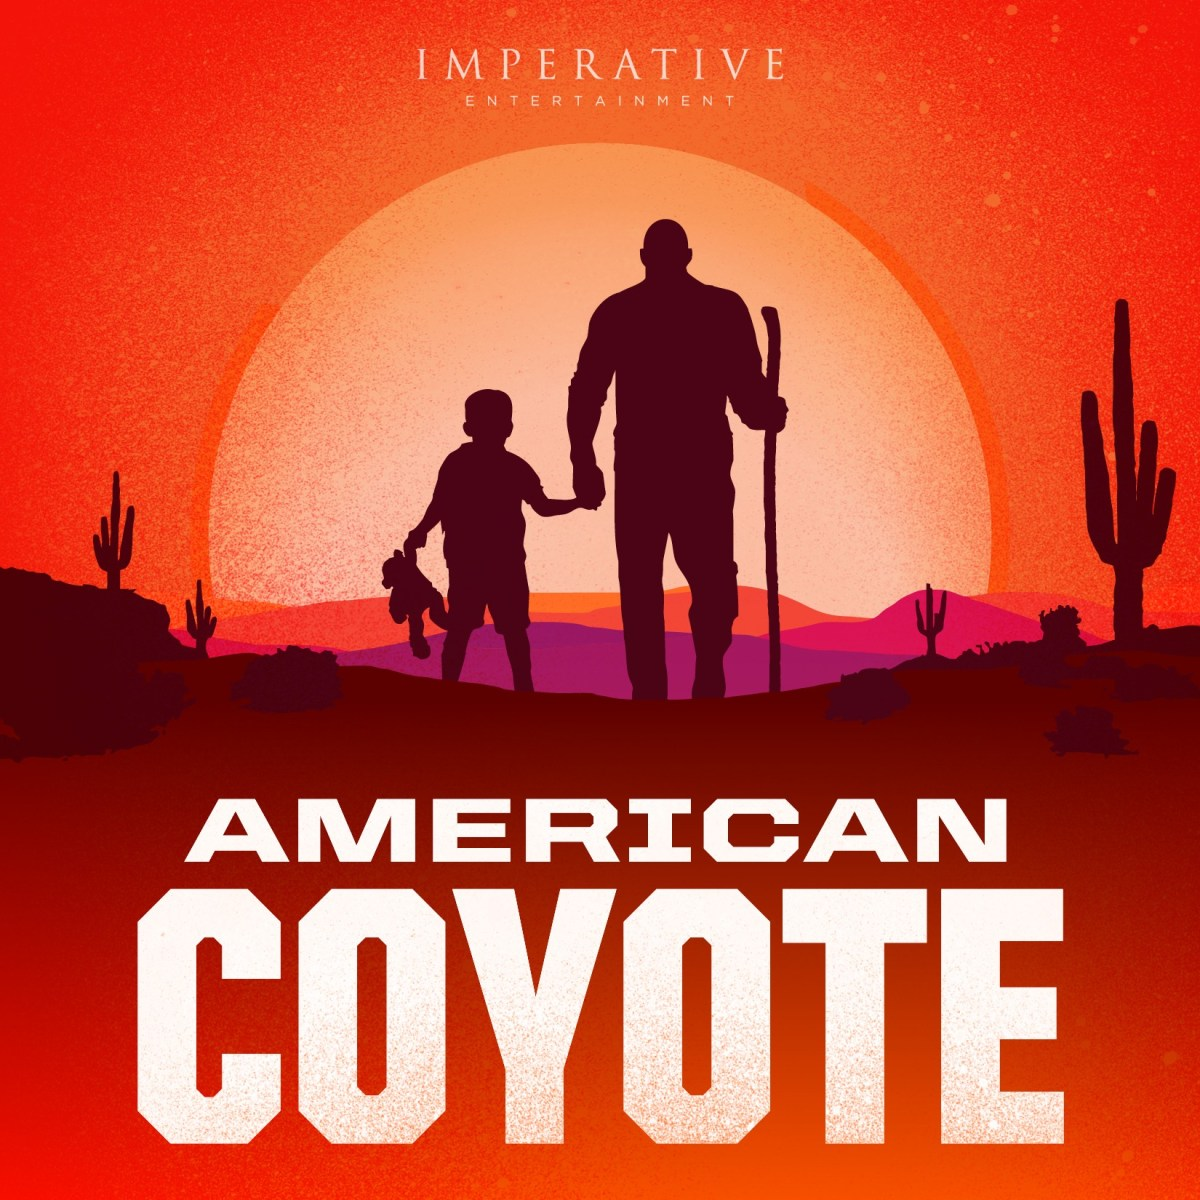 American Coyote